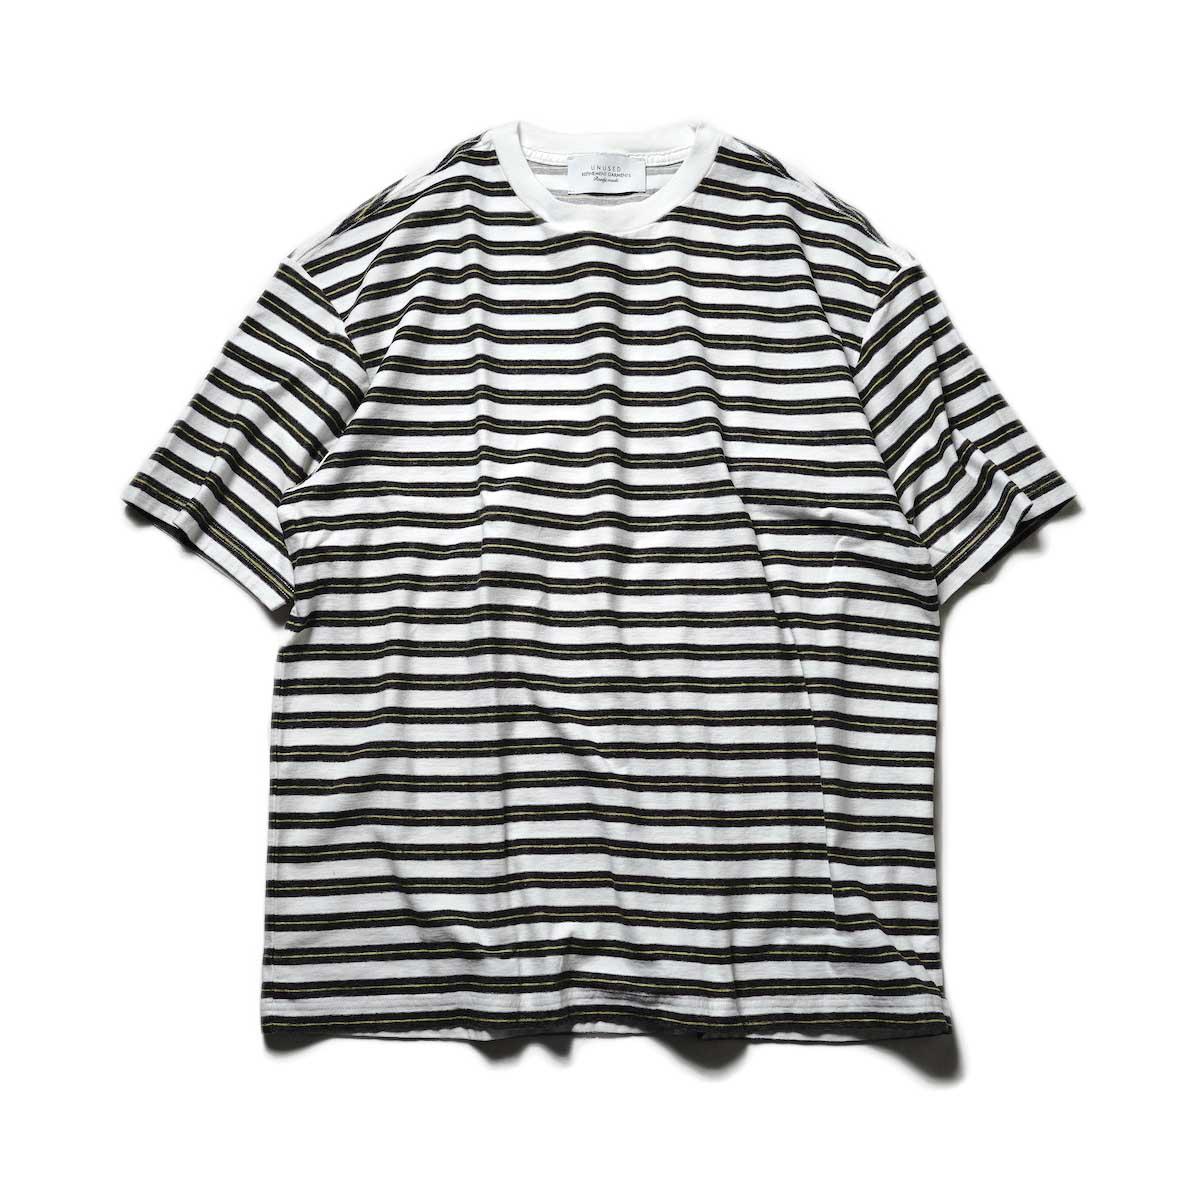 UNUSED / US2108 Border t-shirt (White × Black)